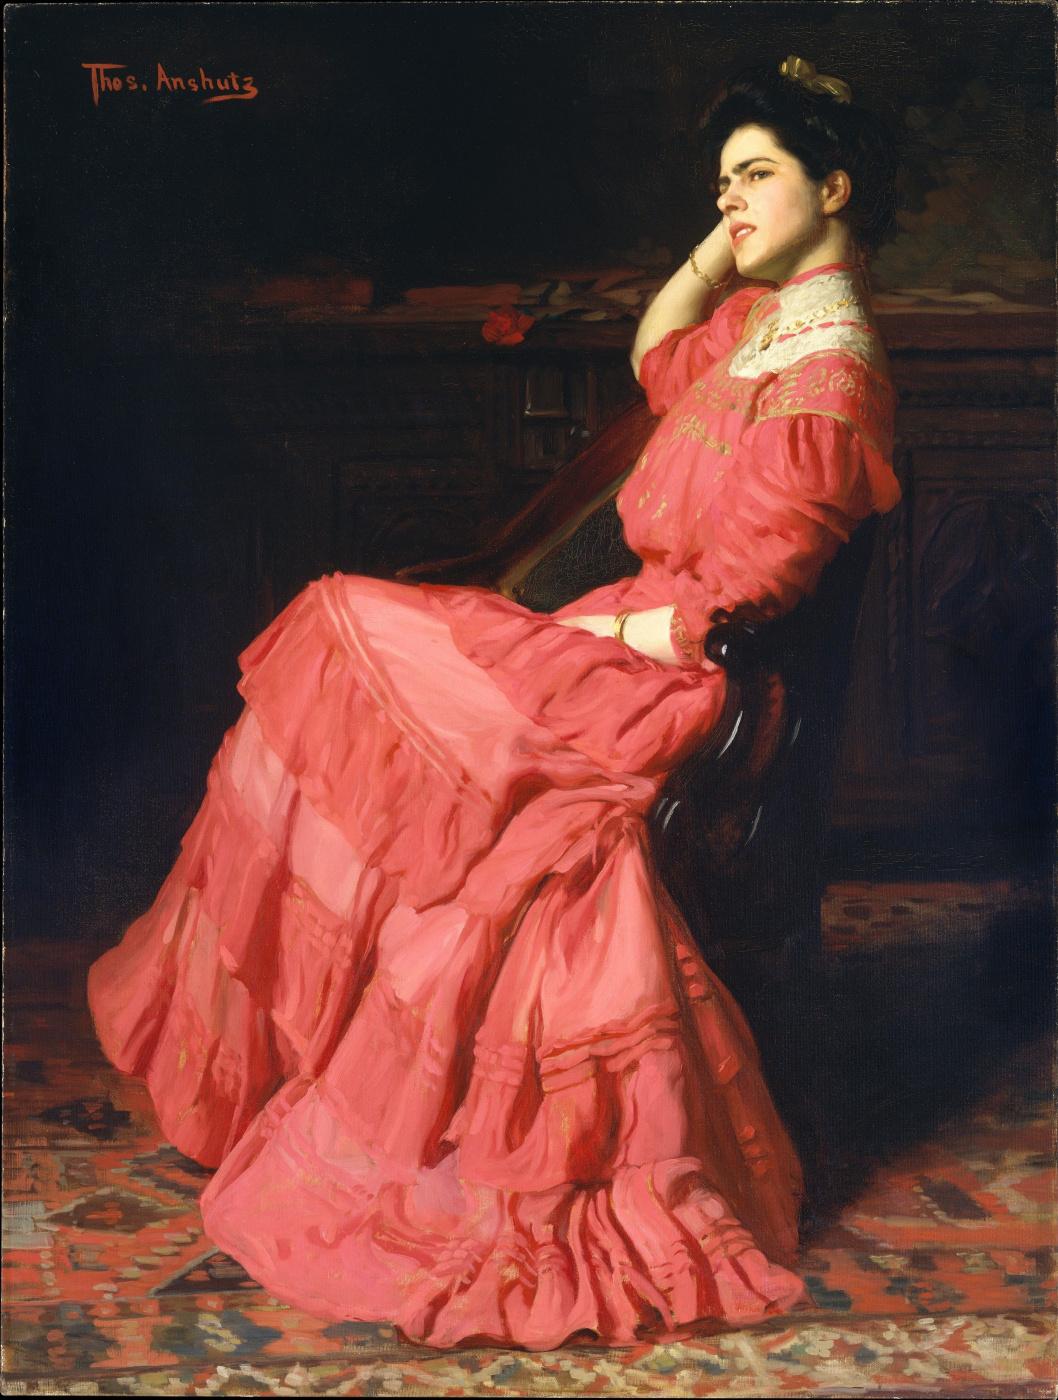 Thomas Pollock Anschutz. Rose